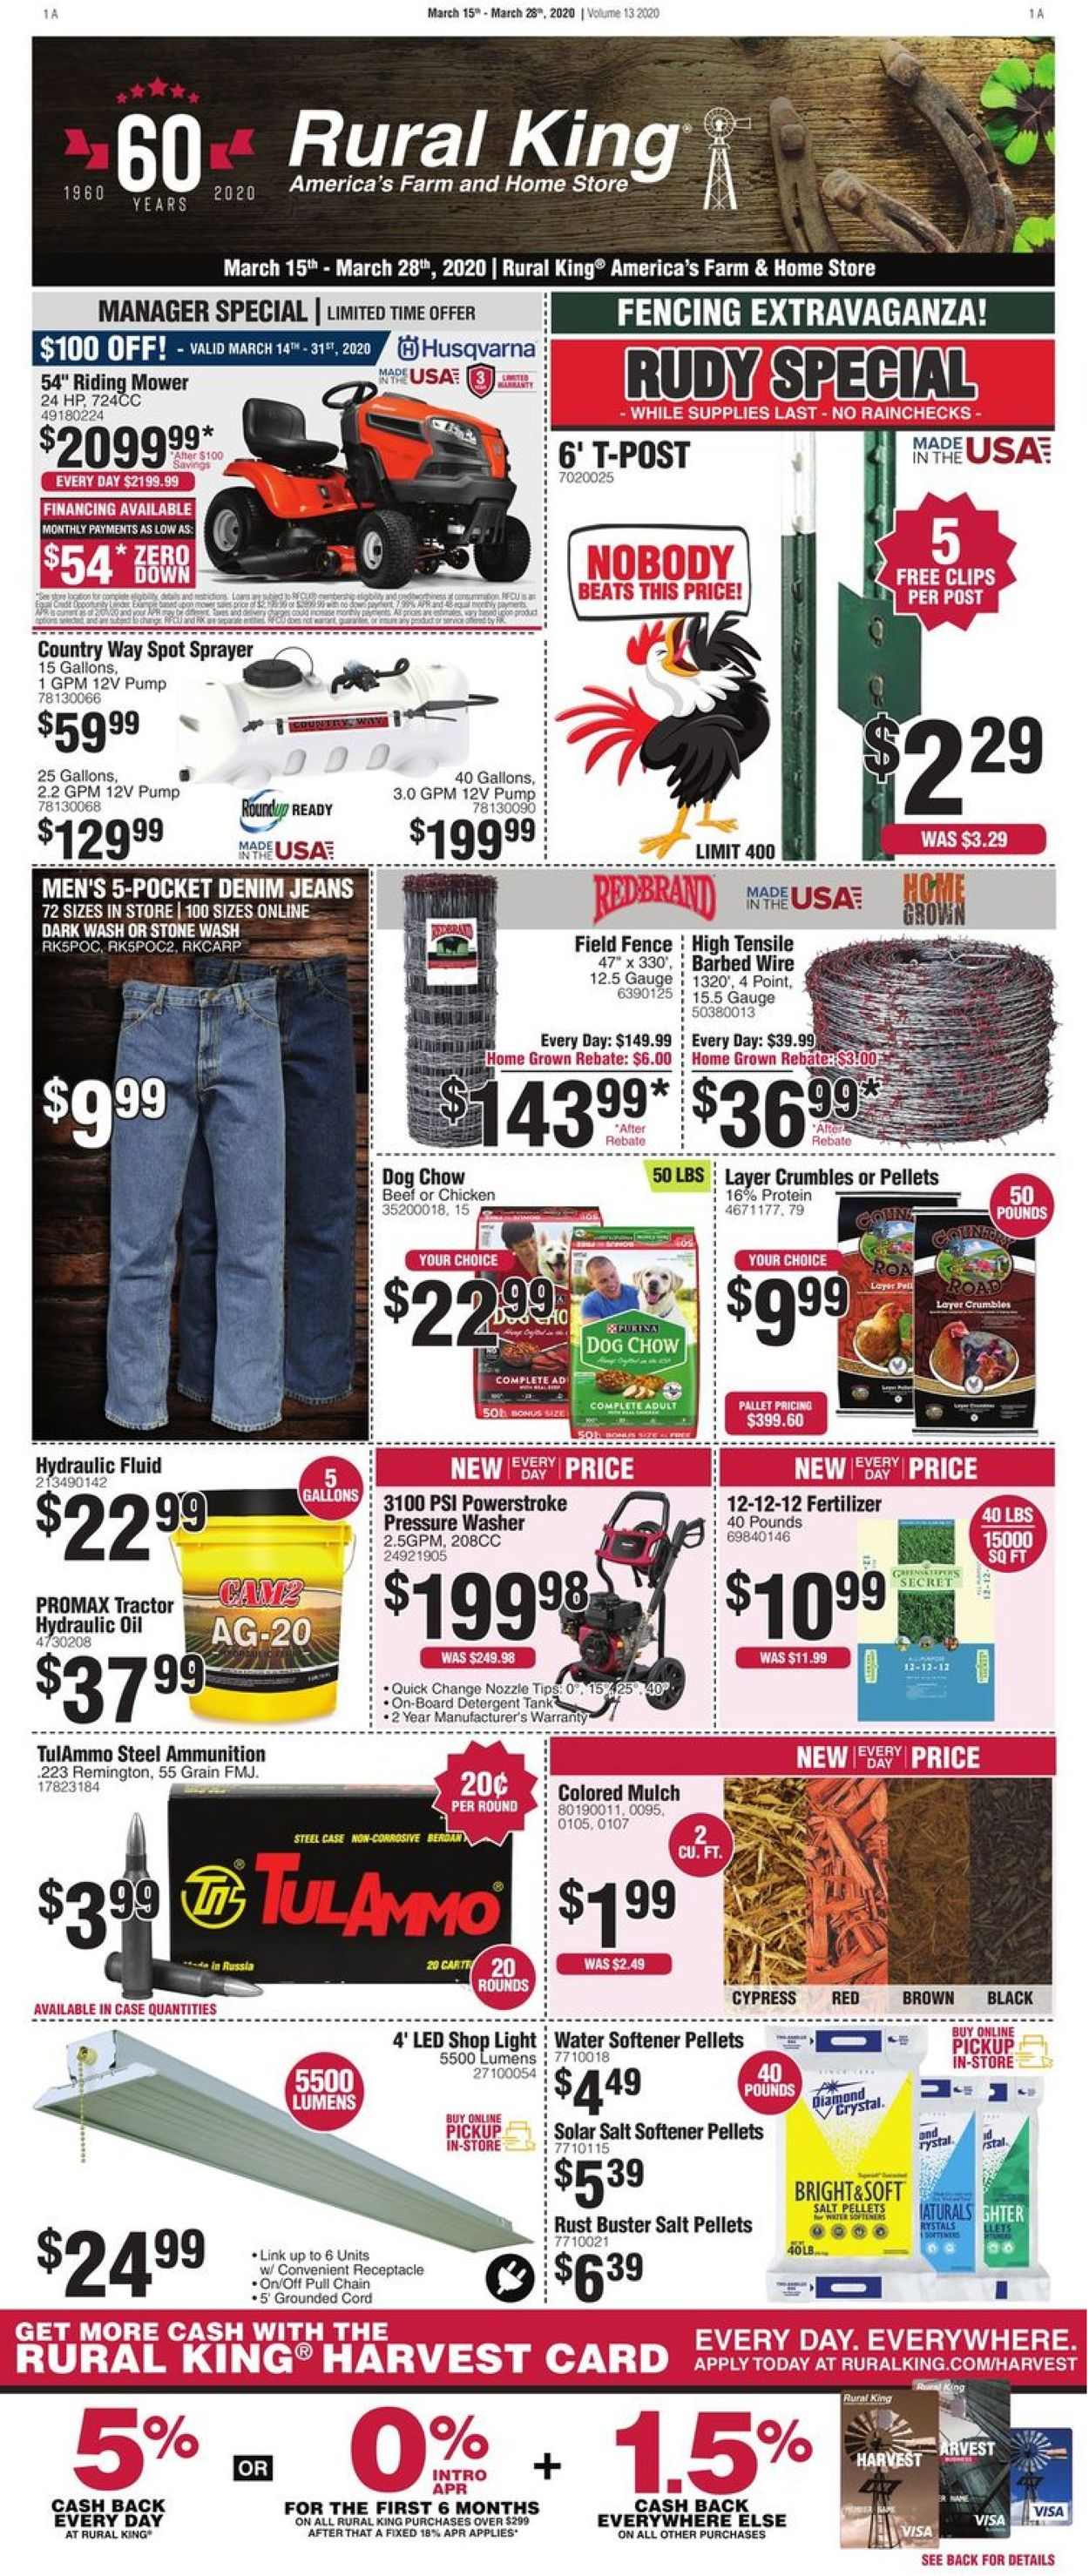 Rural King Weekly Ad Circular - valid 03/15-03/28/2020